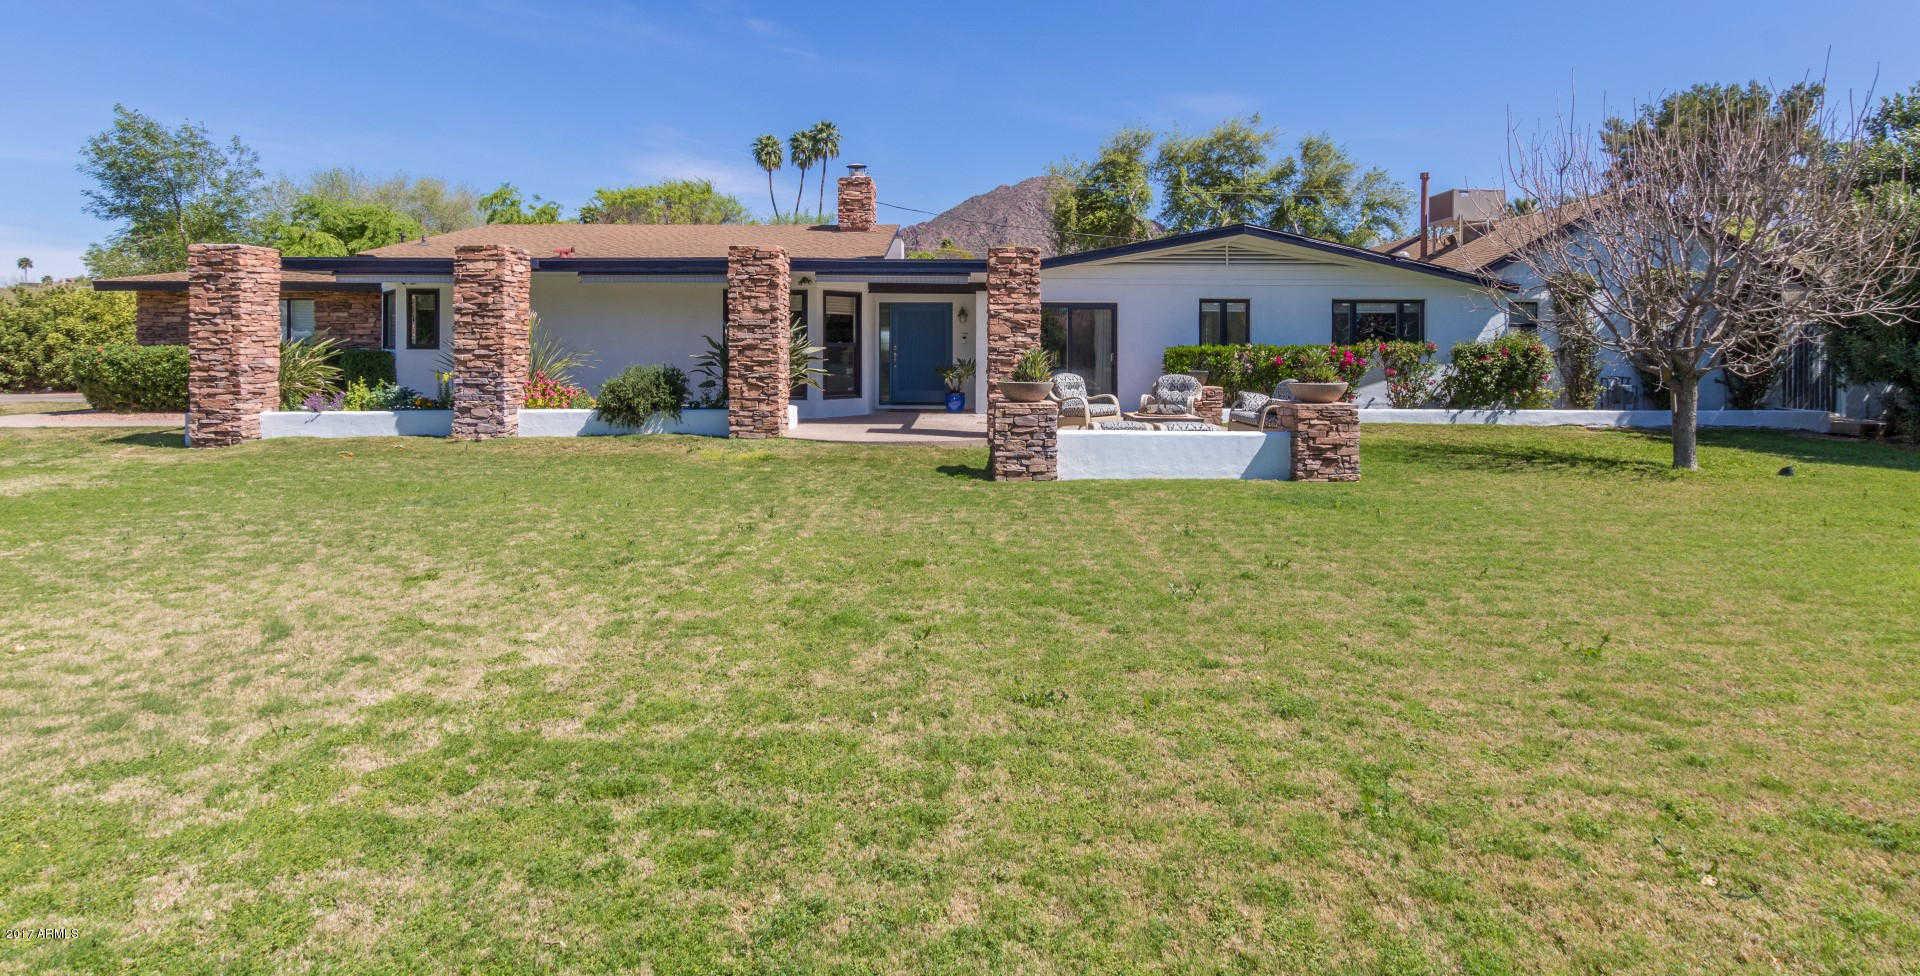 $1,300,000 - 4Br/3Ba - Home for Sale in Lafayette Villa 3, Phoenix